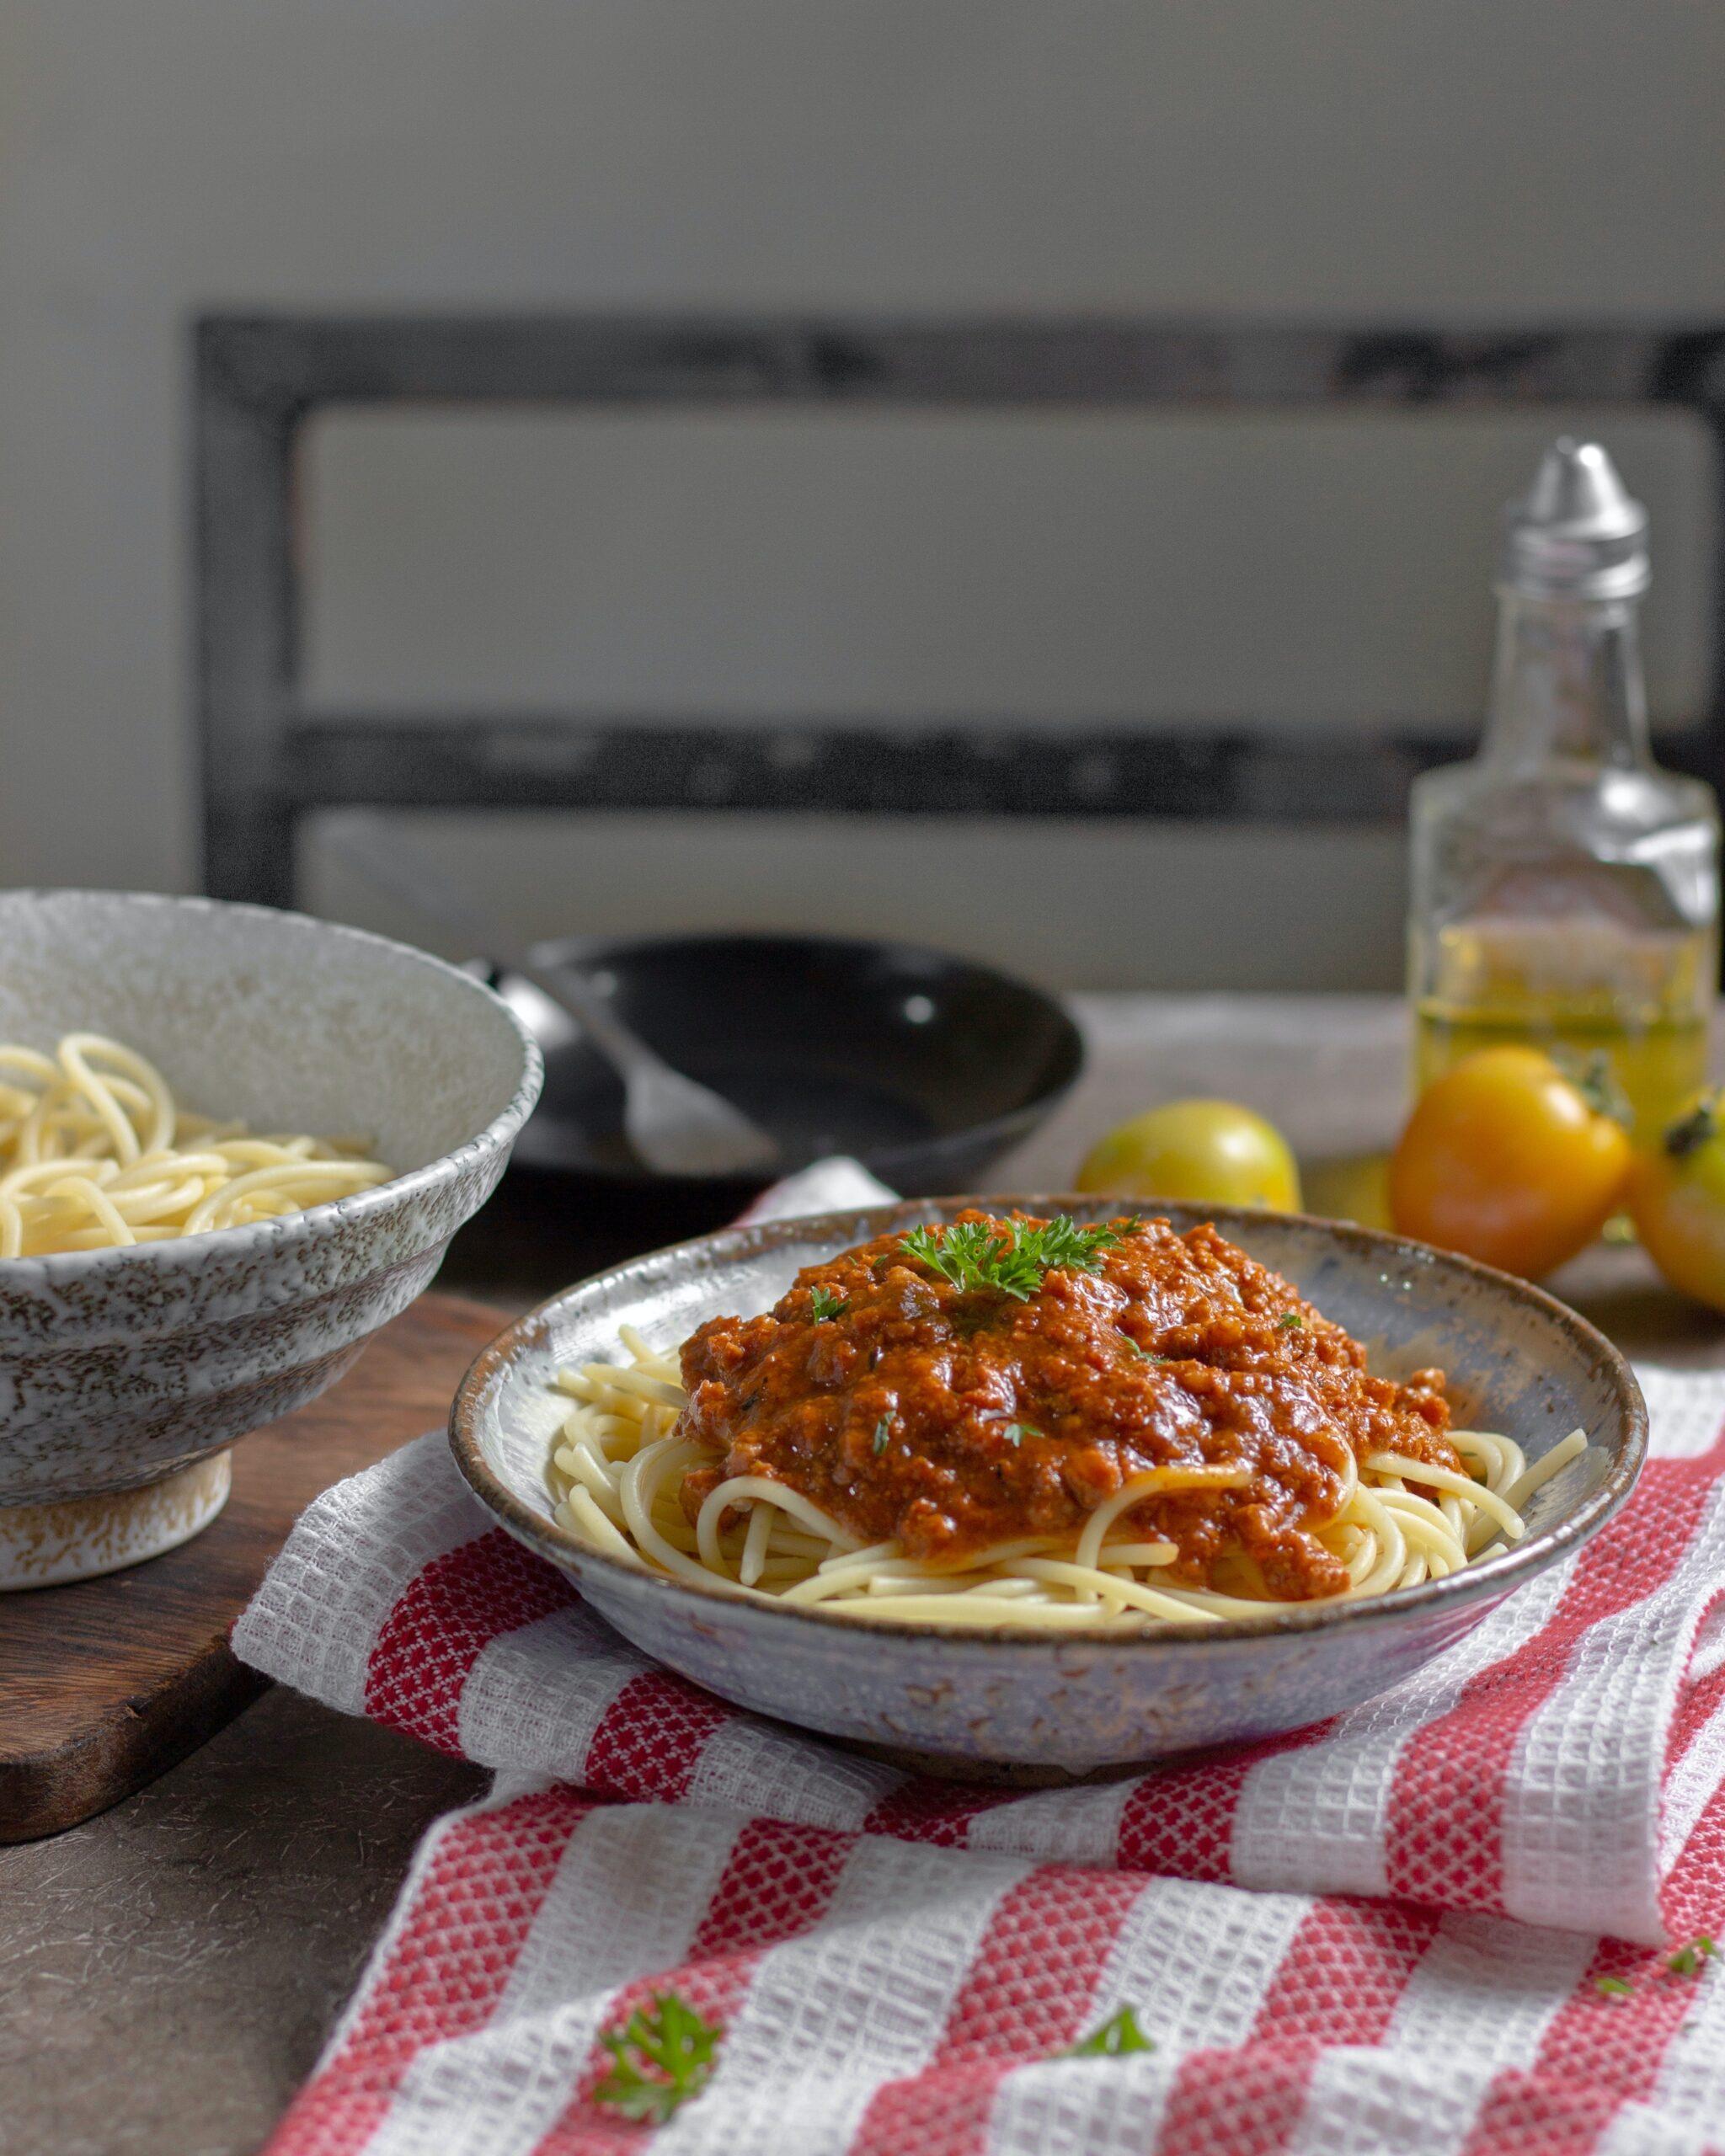 spaghetti bol nerfee-mirandilla-KxcYYoJZehI-unsplash